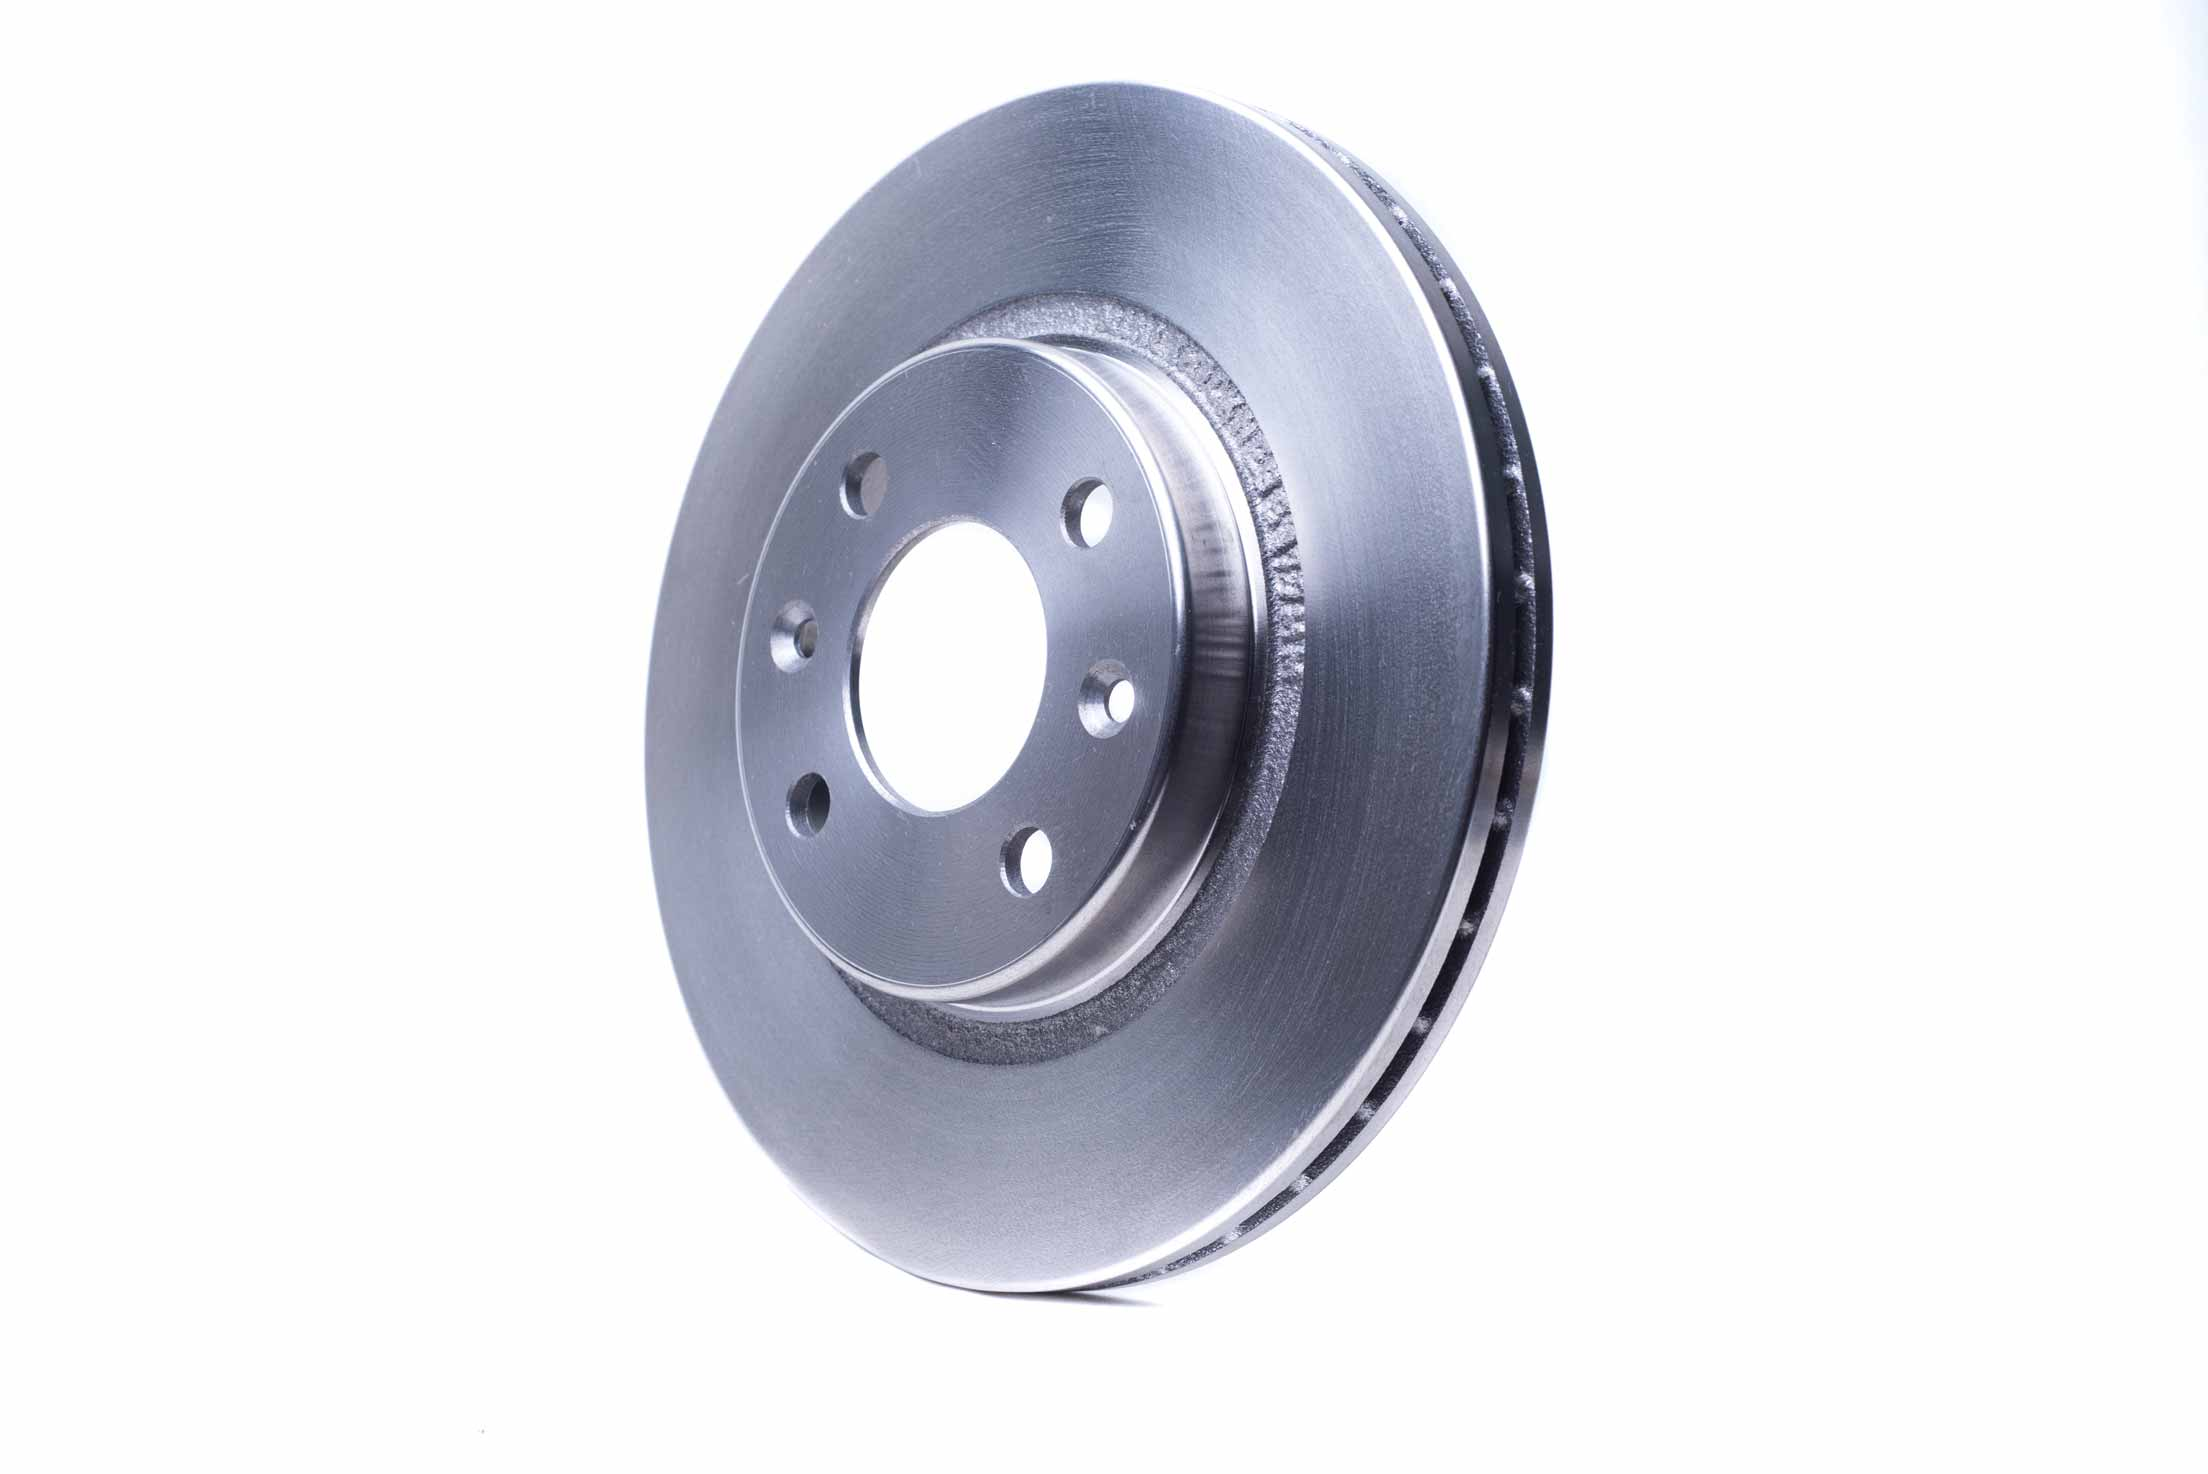 L90 front wheel disc